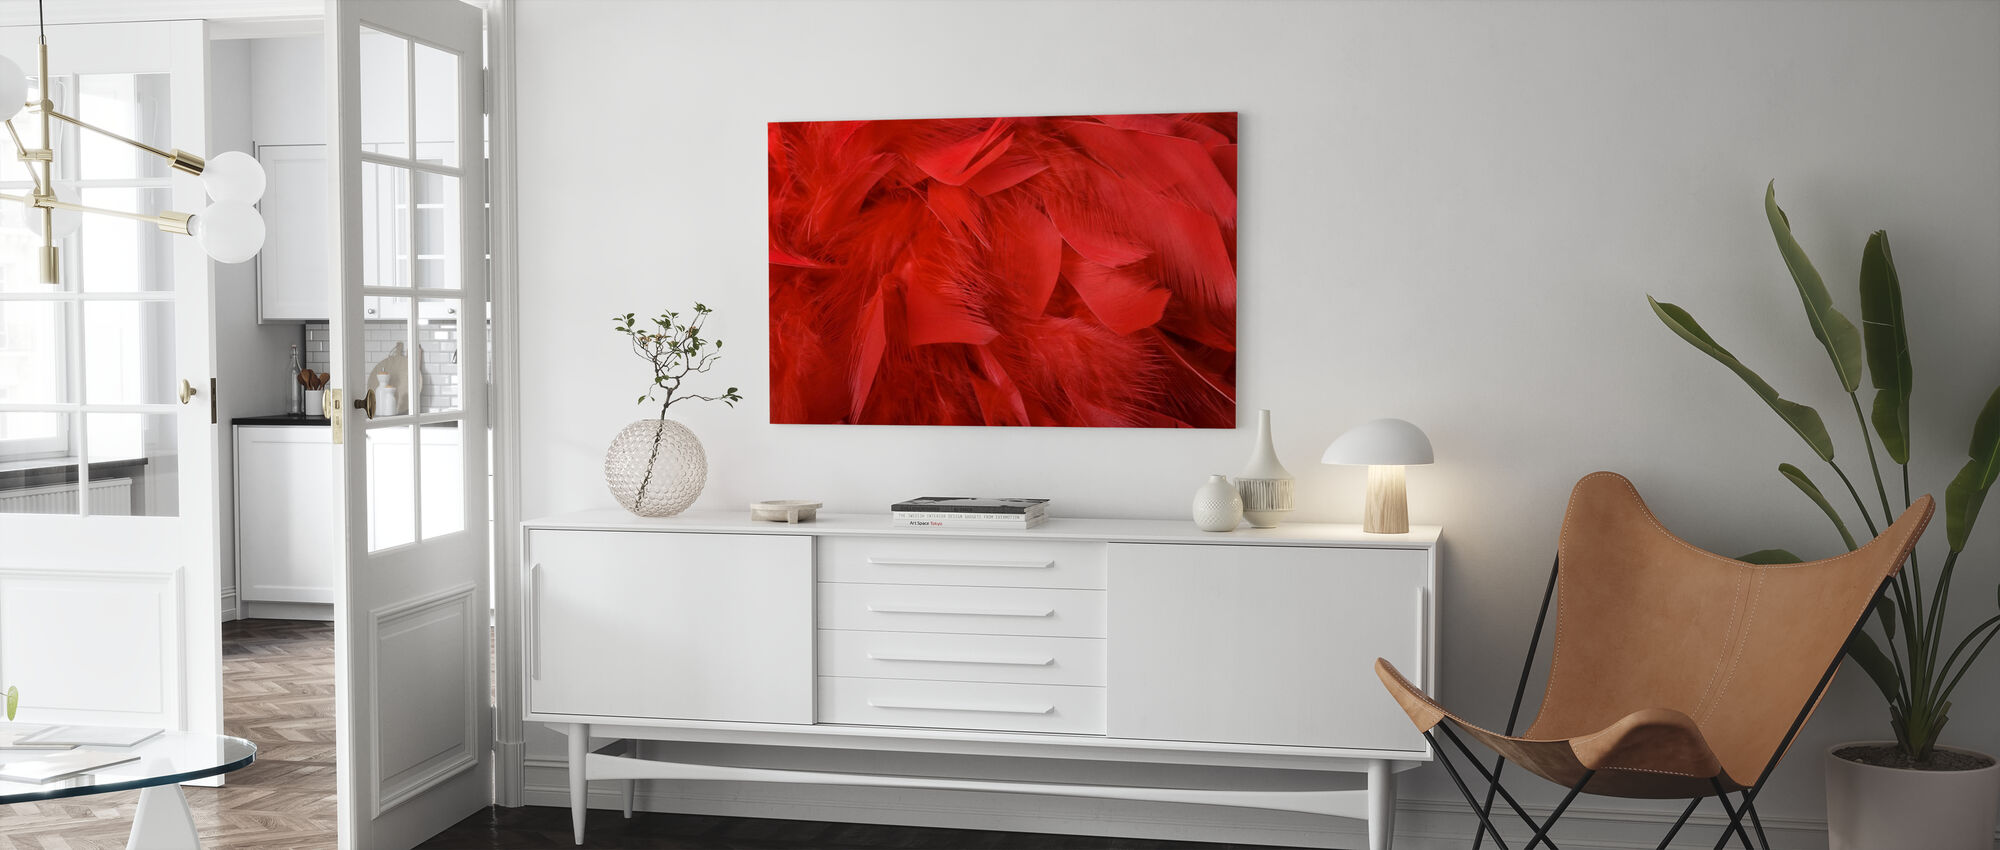 Rode Veren - Canvas print - Woonkamer